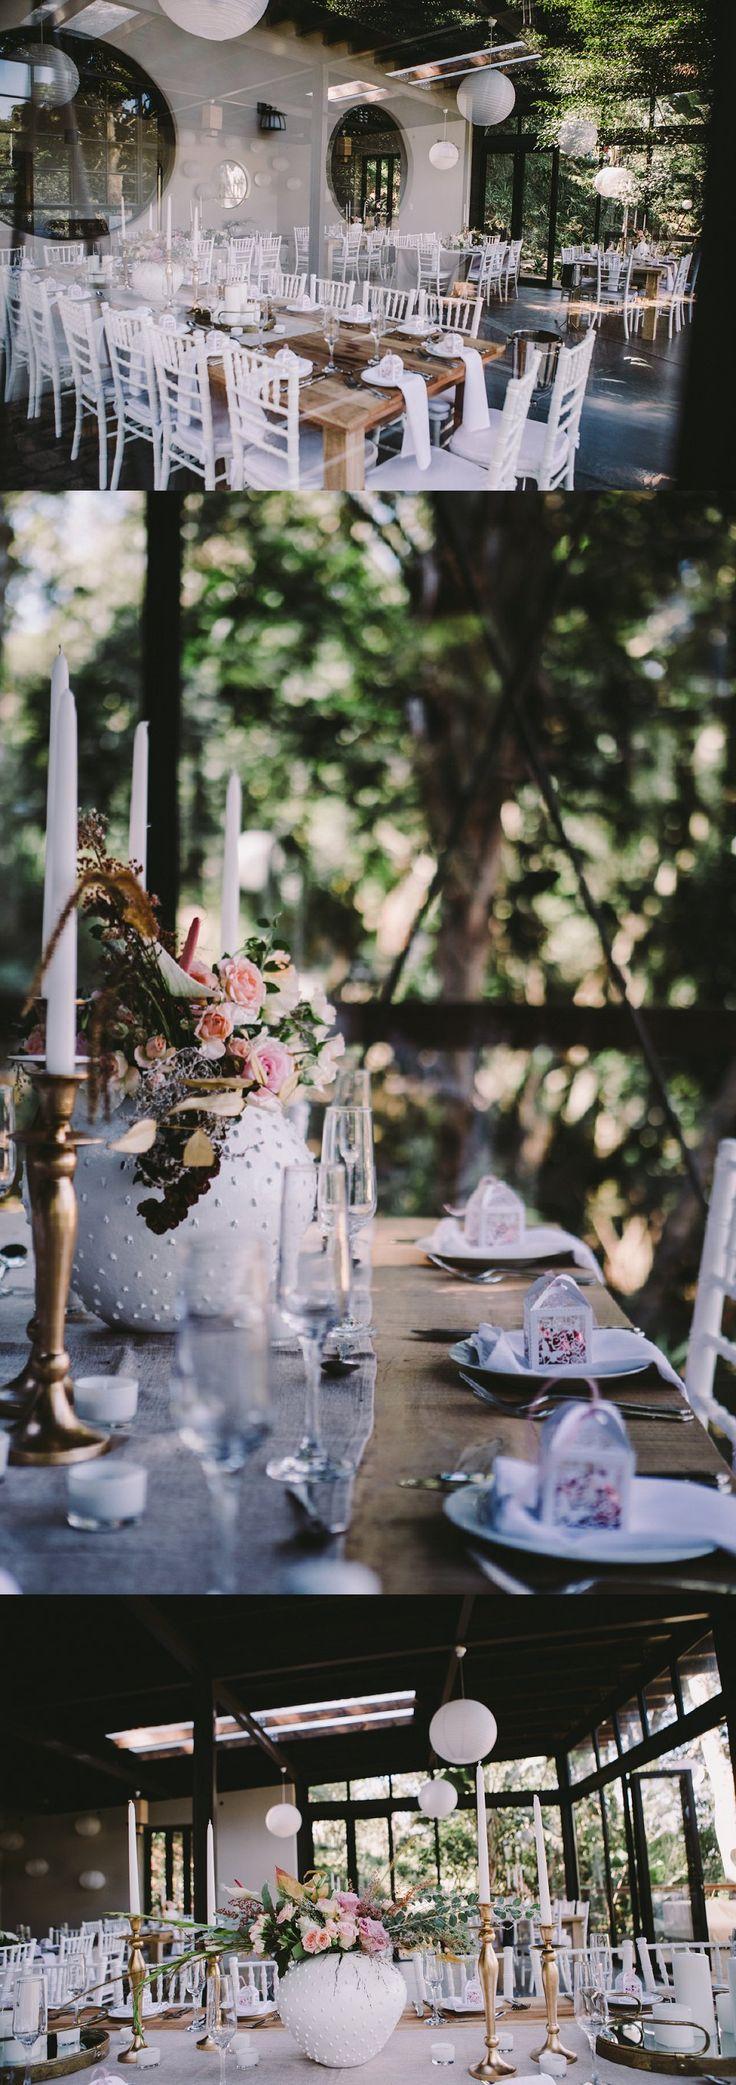 Cindy & Steyn's small environmental retreat wedding